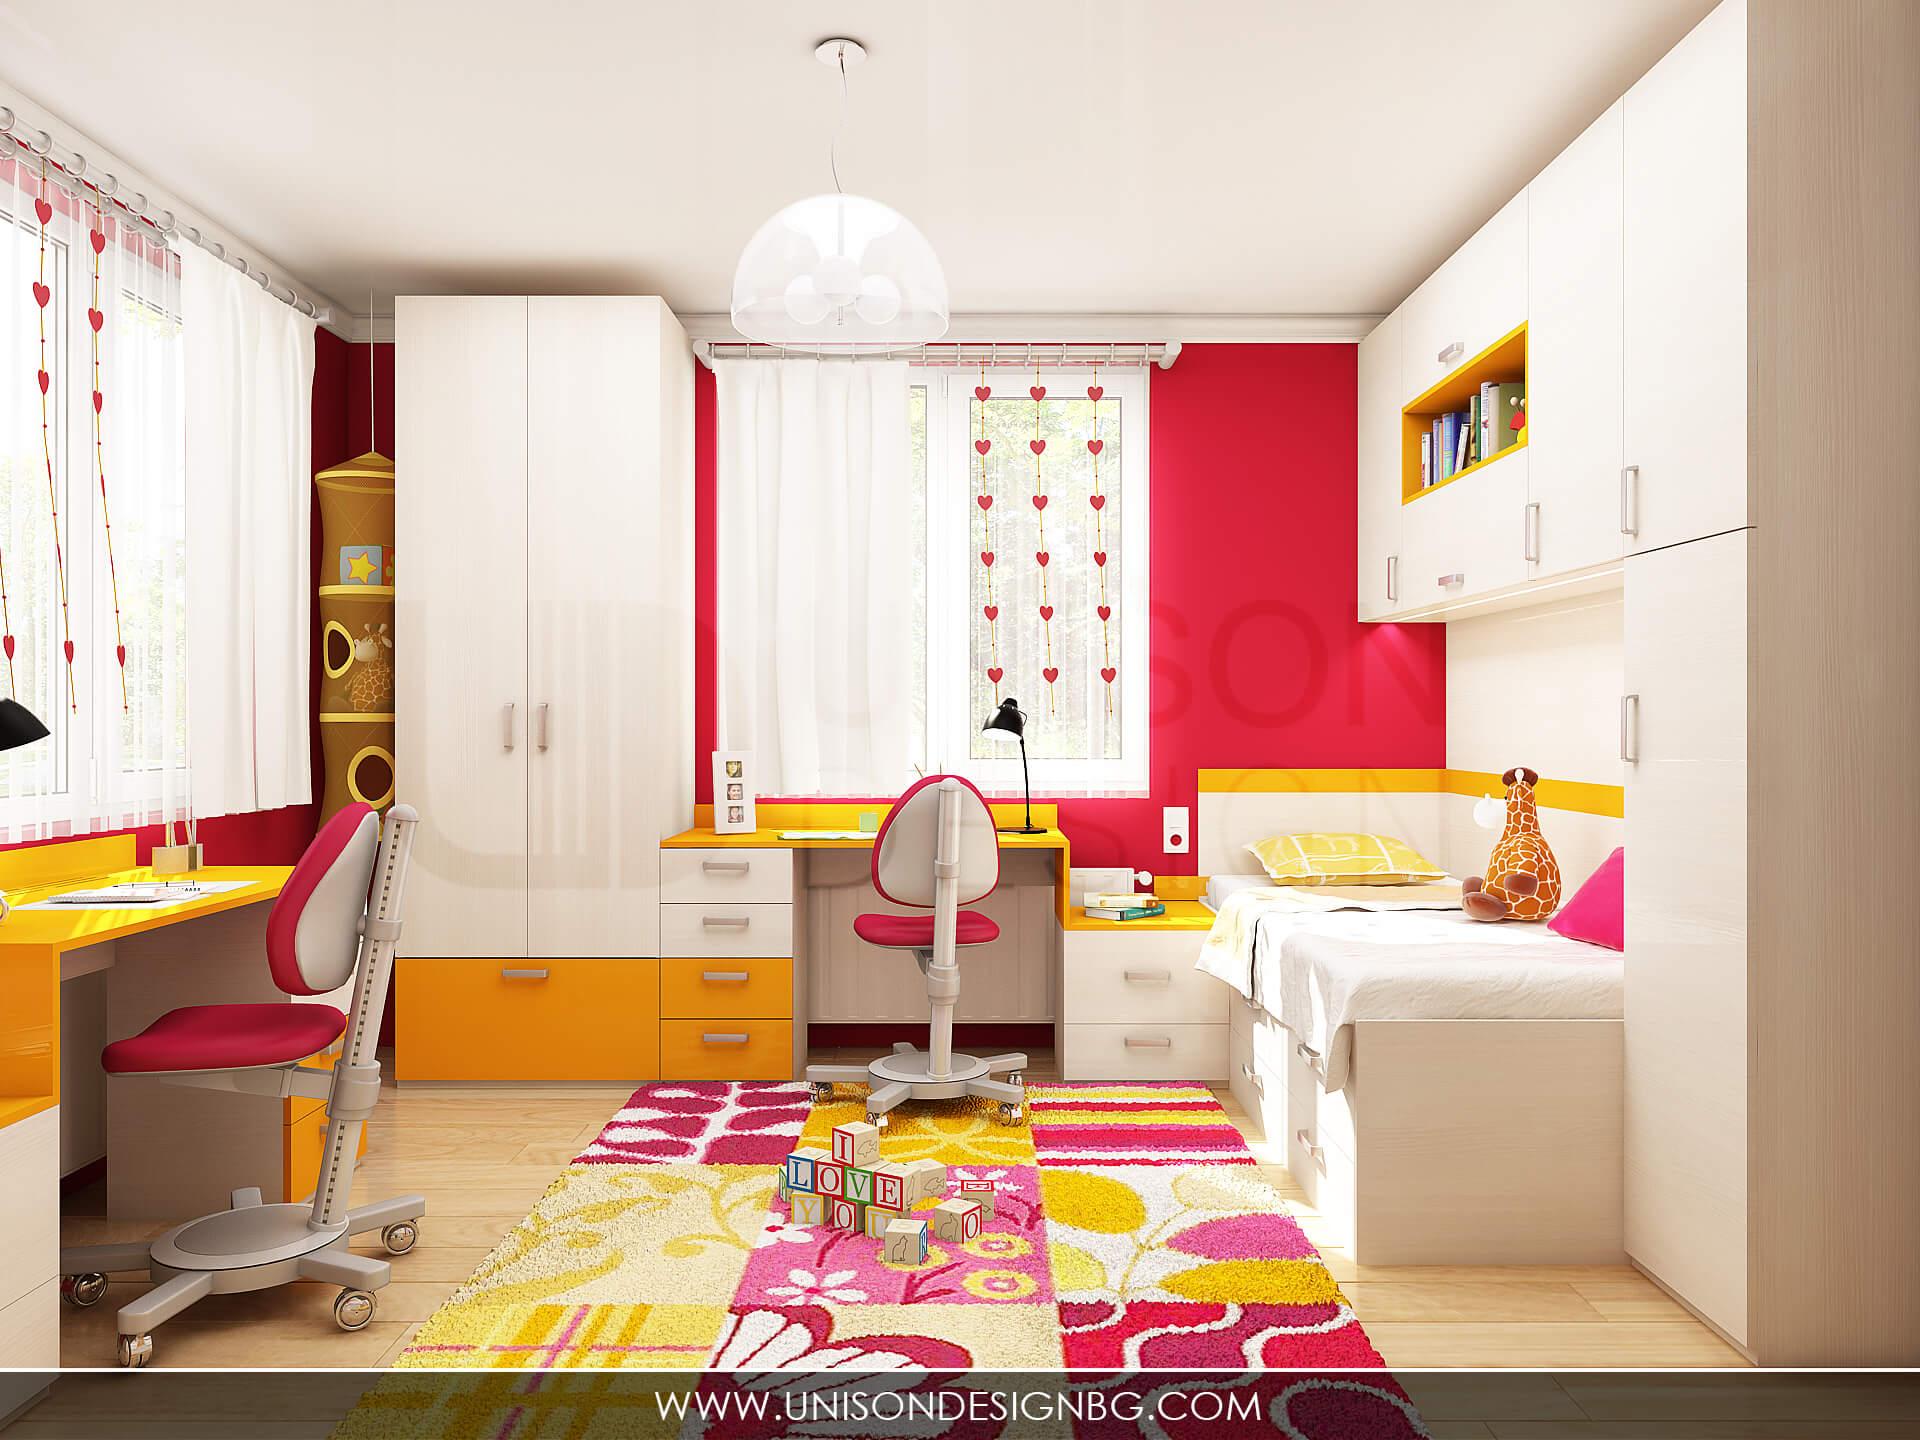 Детска-стая-момичета-детско-обзавеждане-детски-мебели-по-поръчка-detsko-obzavejdane-интериорен-дизайн-визуализация-detskko-obzavejdane-mebeli-interioren-dizajner